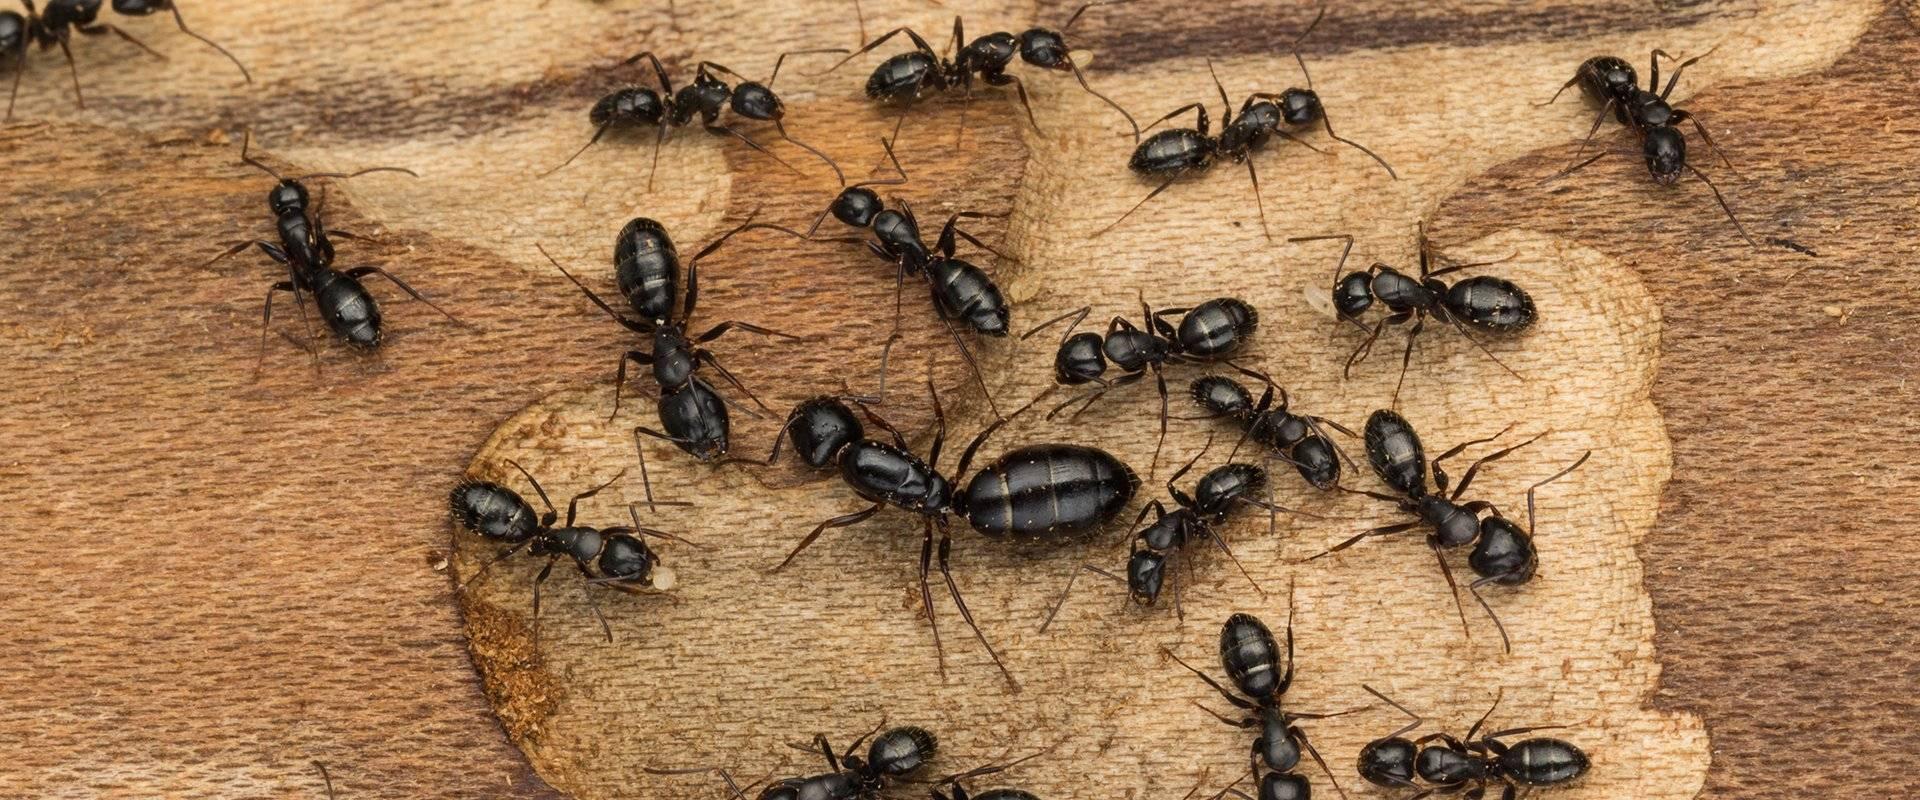 ants up close